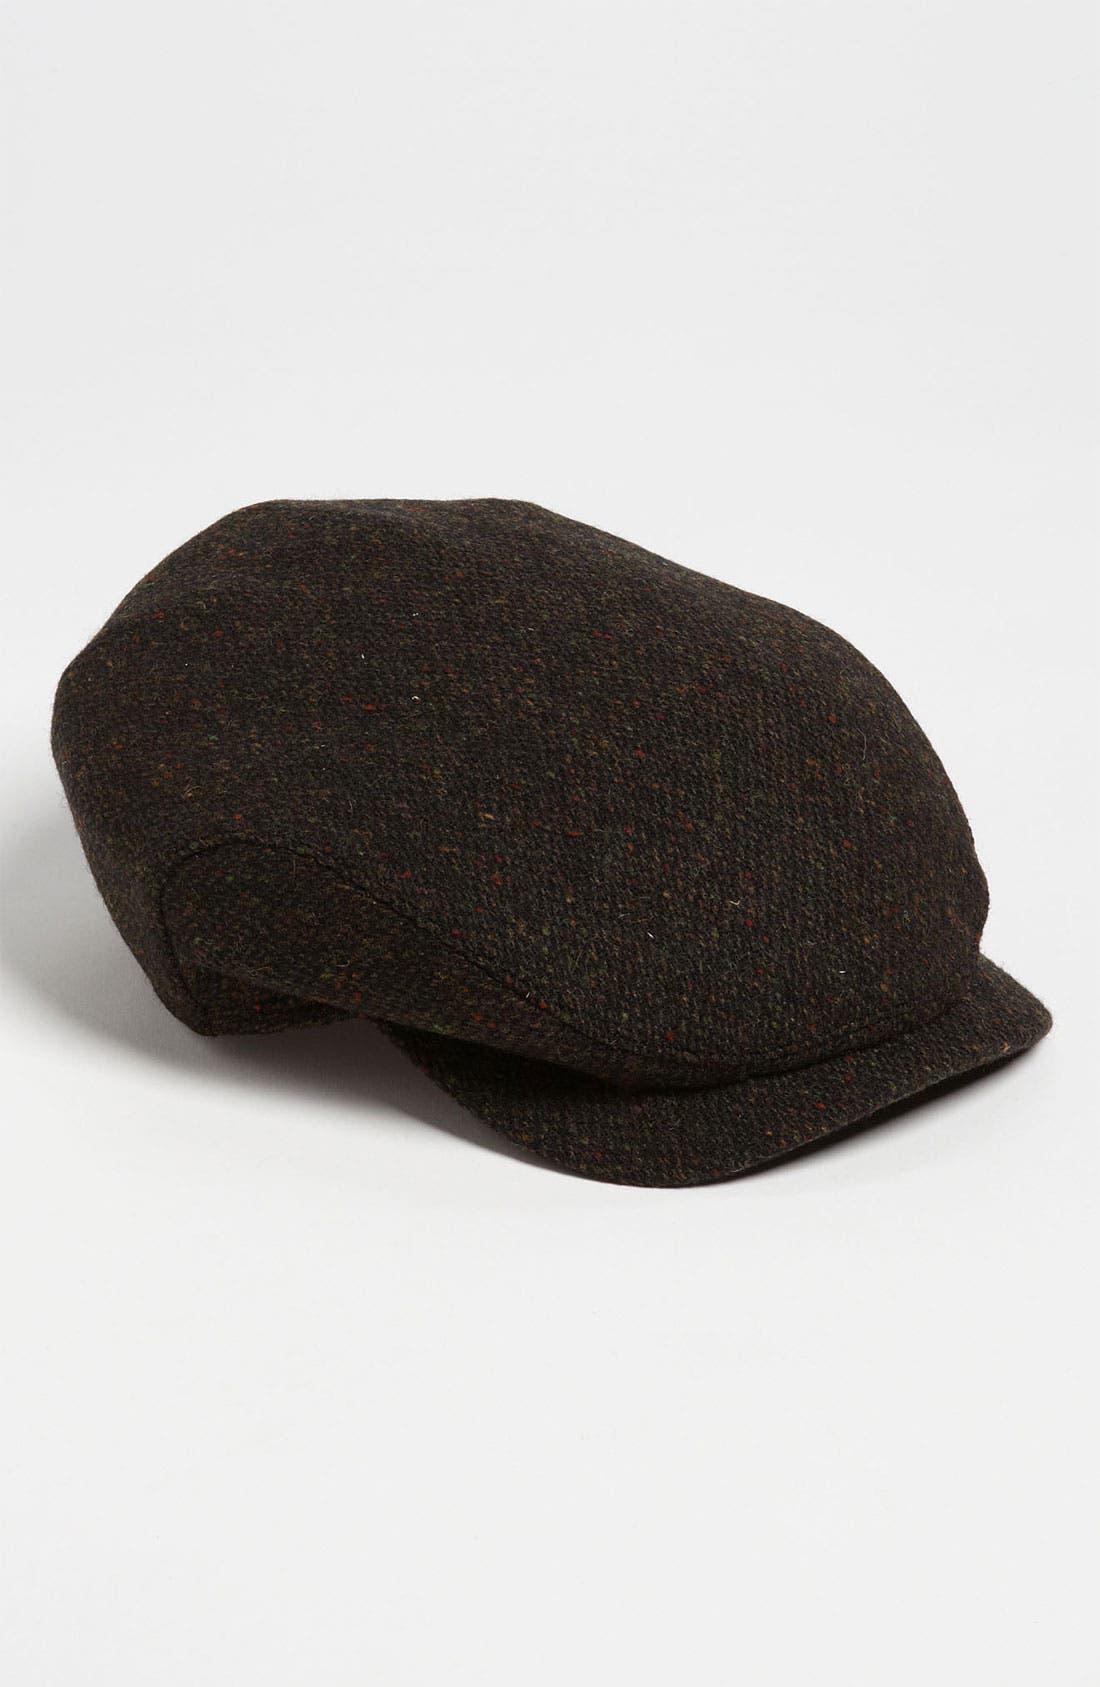 Alternate Image 1 Selected - Wigens Donegal Tweed Earflap Driving Cap